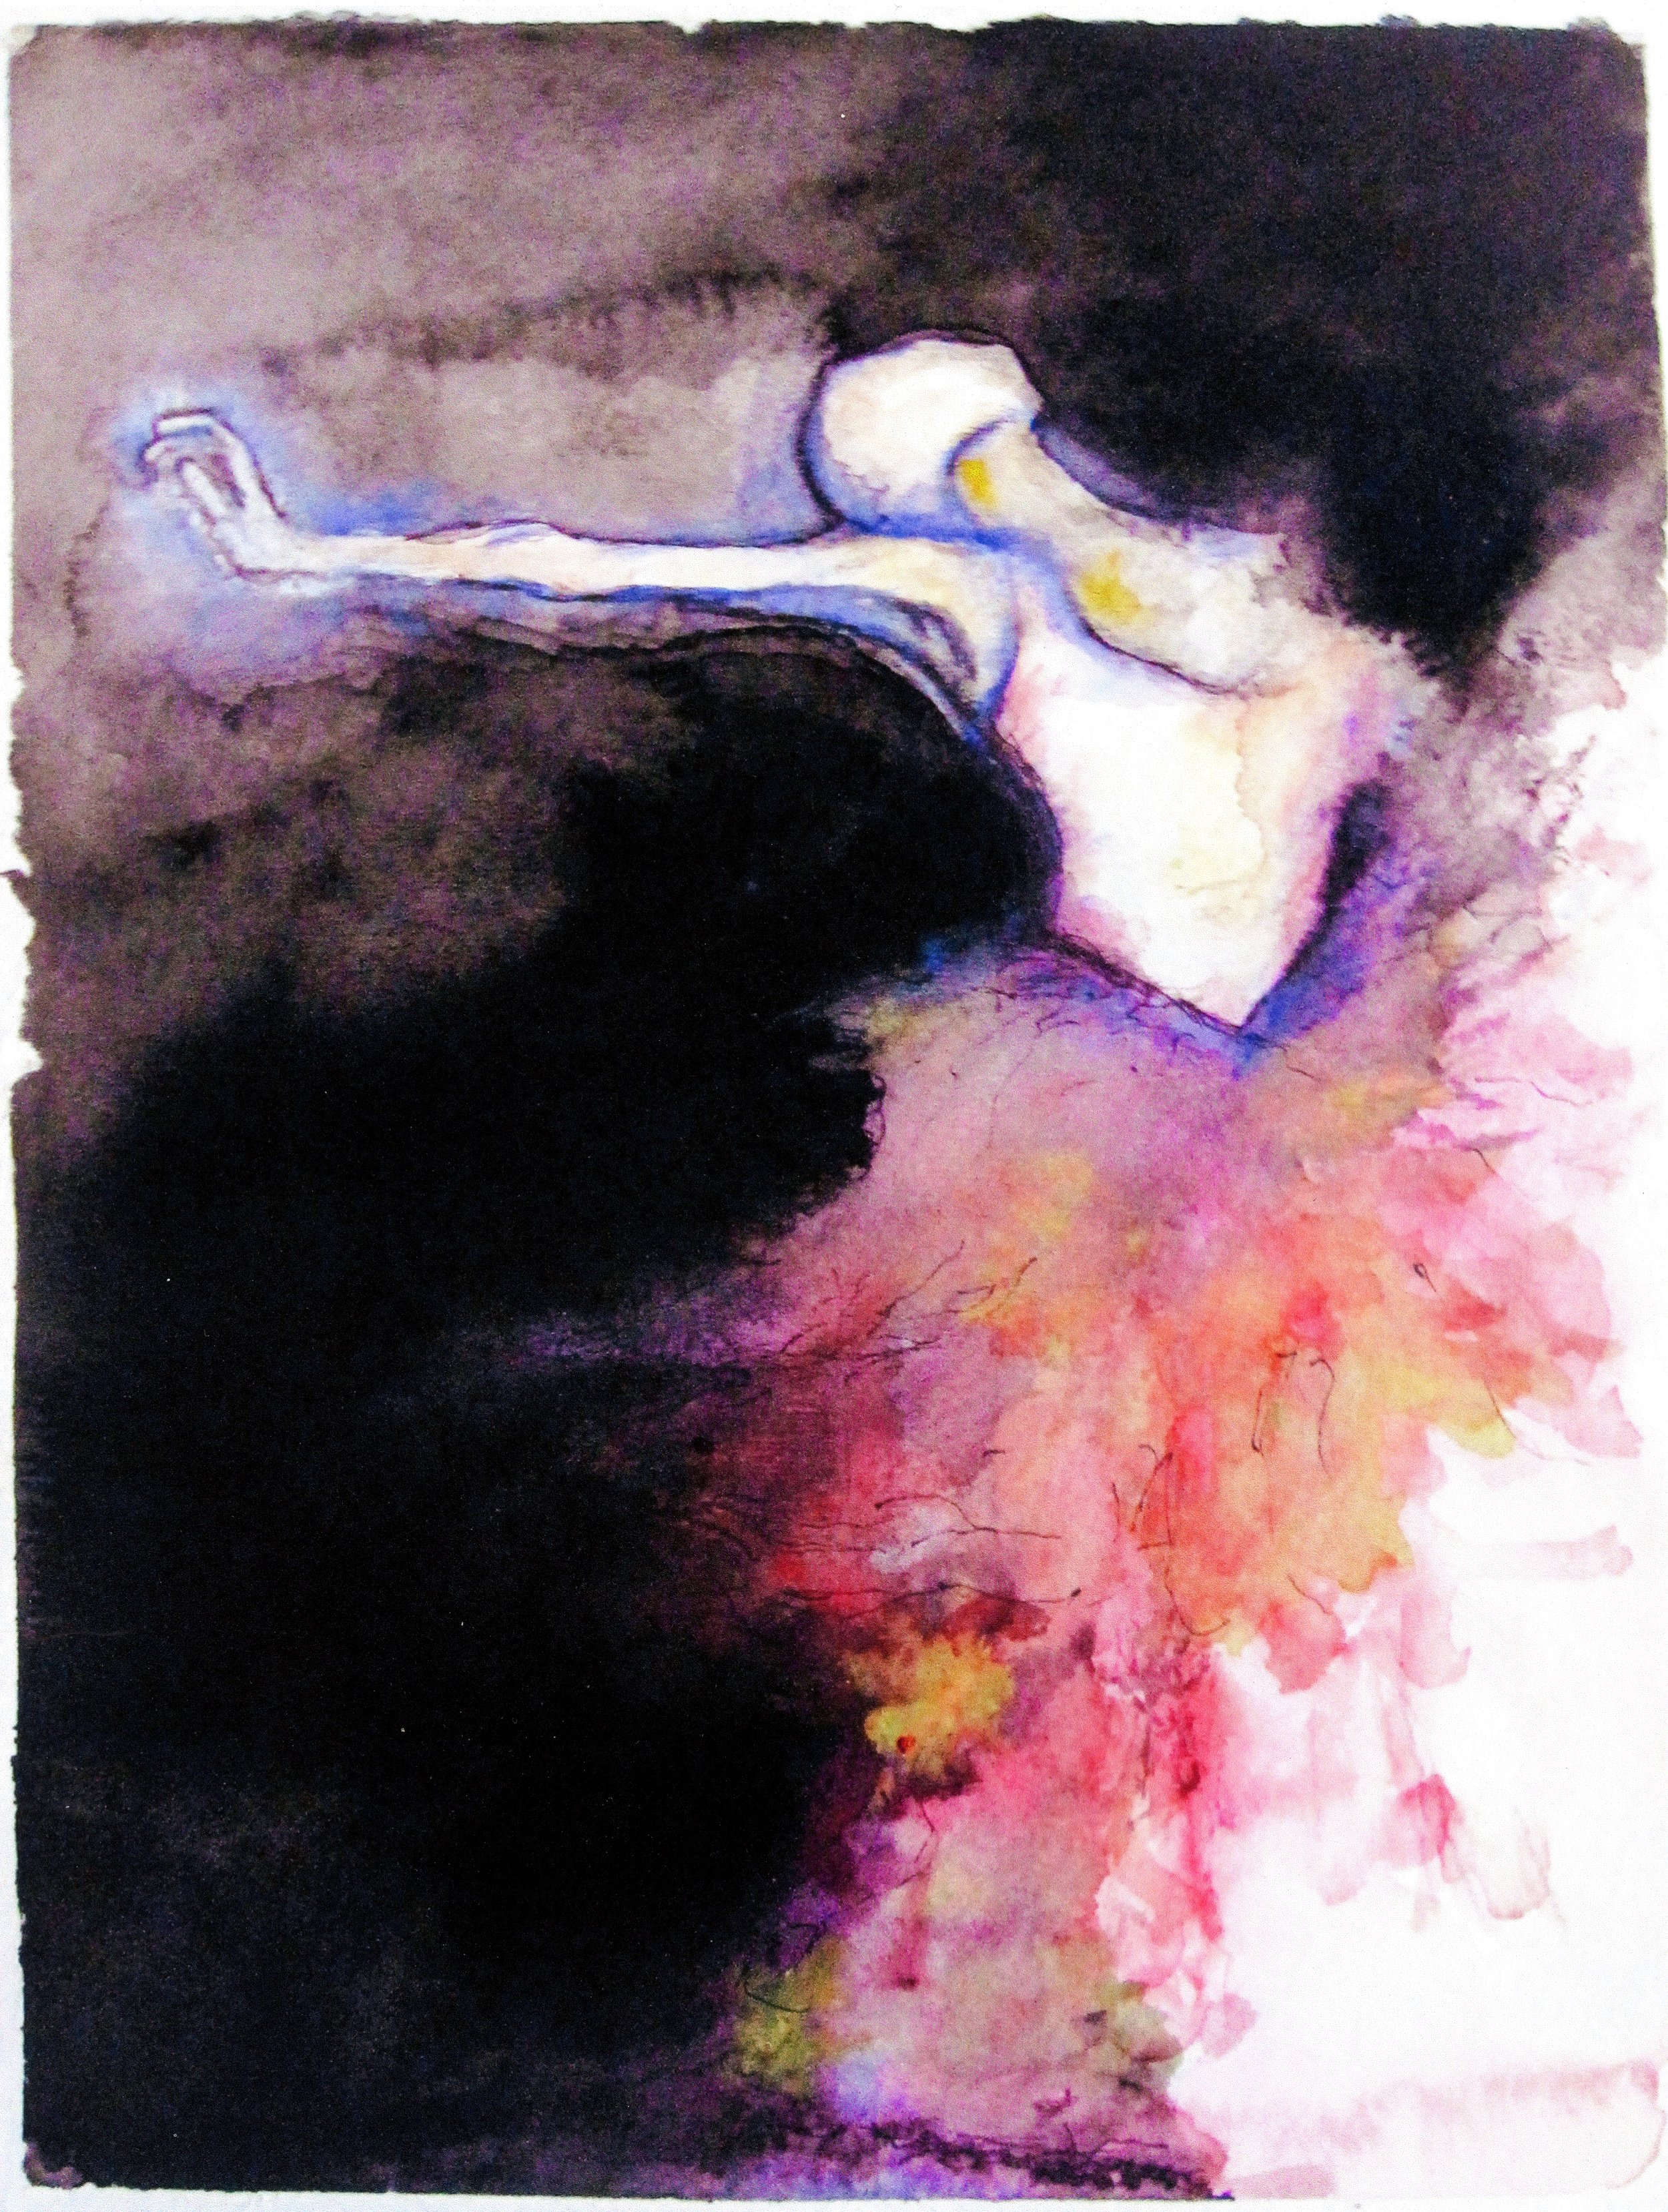 """Metamorphosis"" by Jasmine Sanchez"